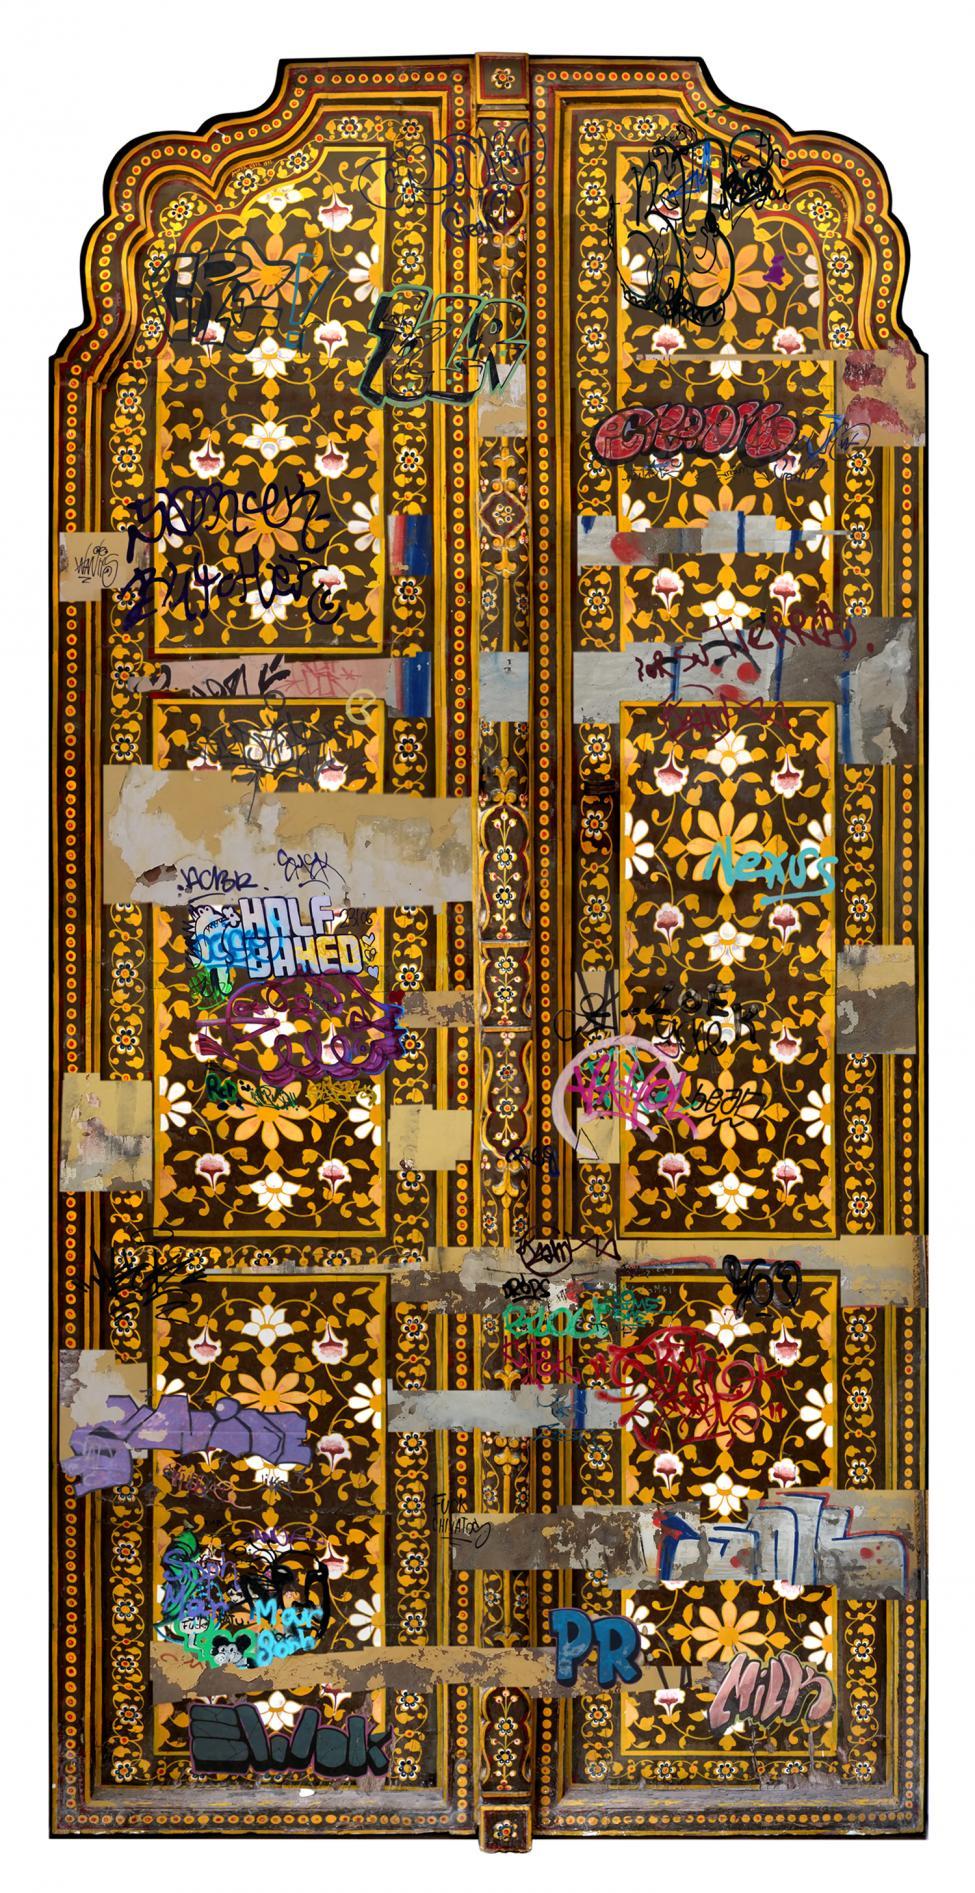 MOTI MAHAL PALACE DOOR - JODHPUR. (2016) - Miriam Durango